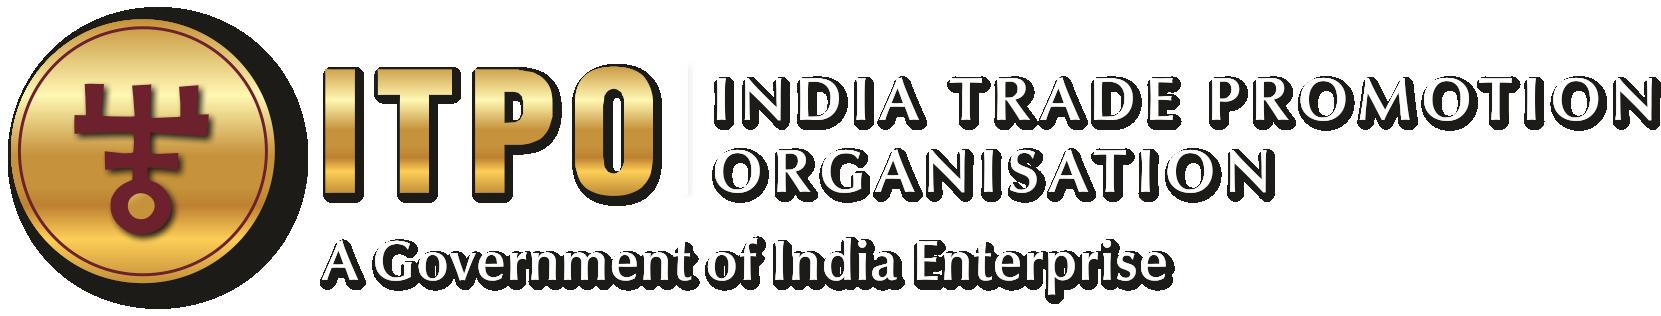 India Trade Promotion Organisation